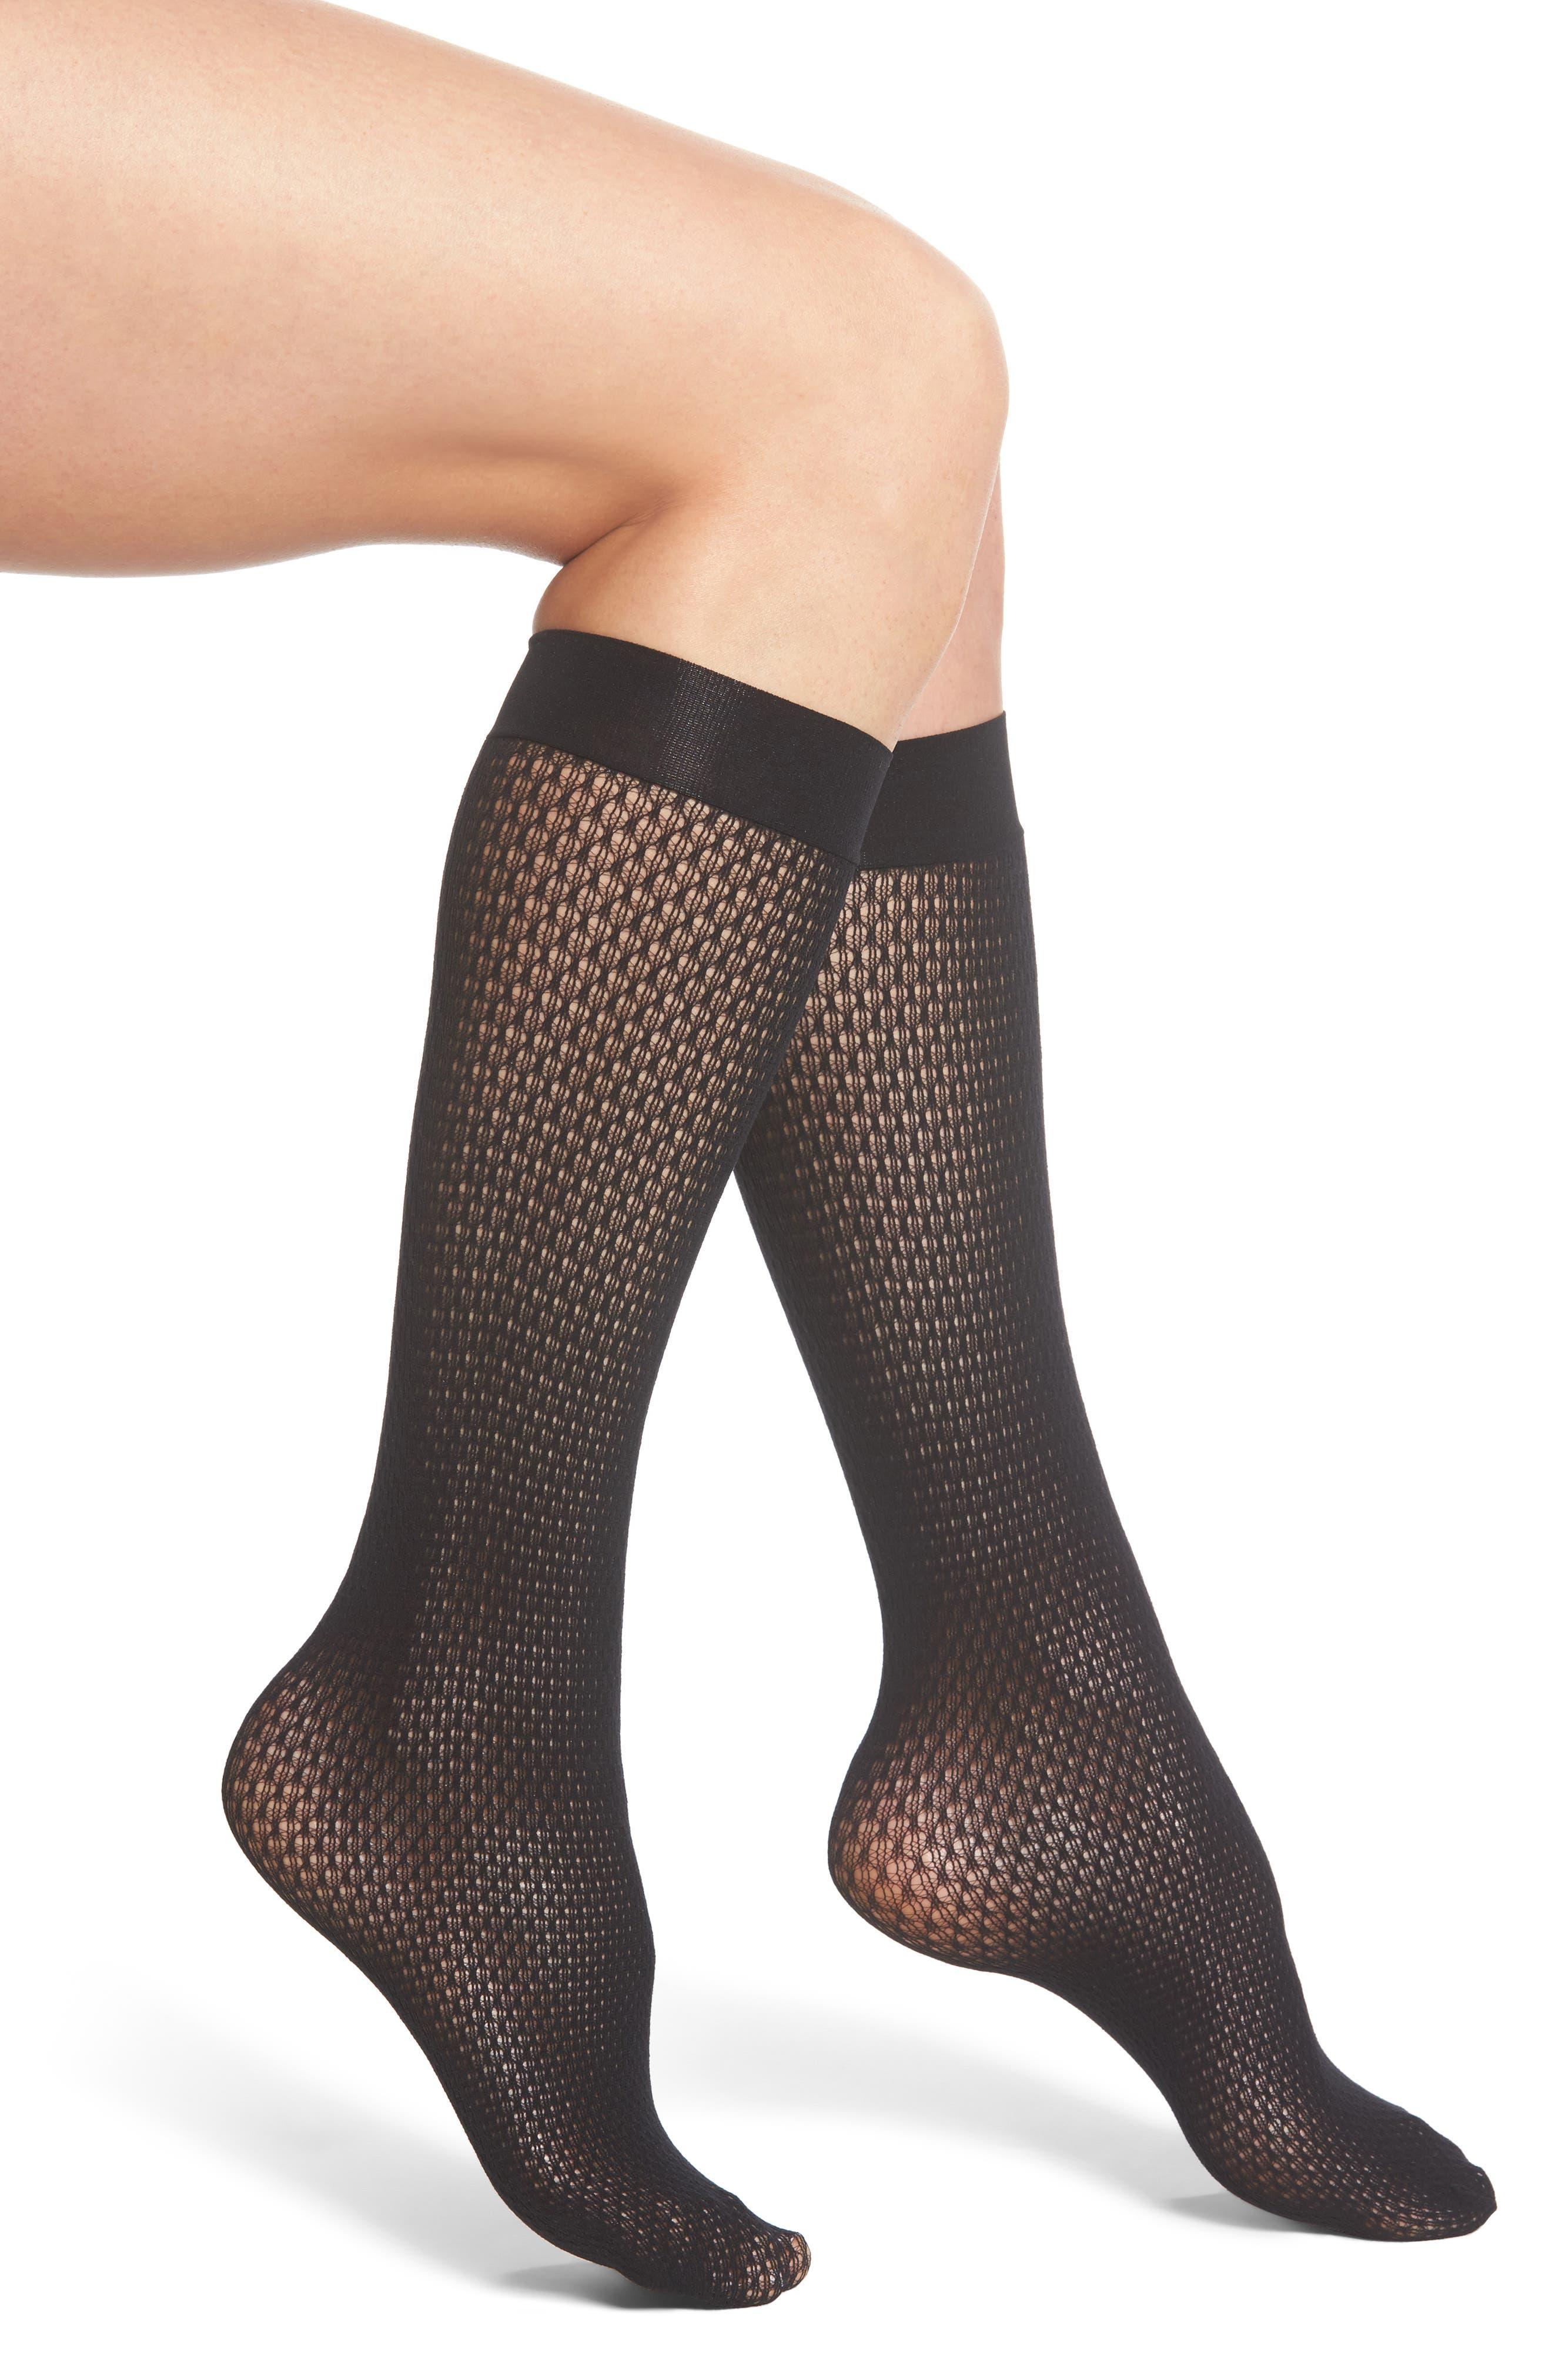 Rhomb Net Knee High Stockings,                             Main thumbnail 1, color,